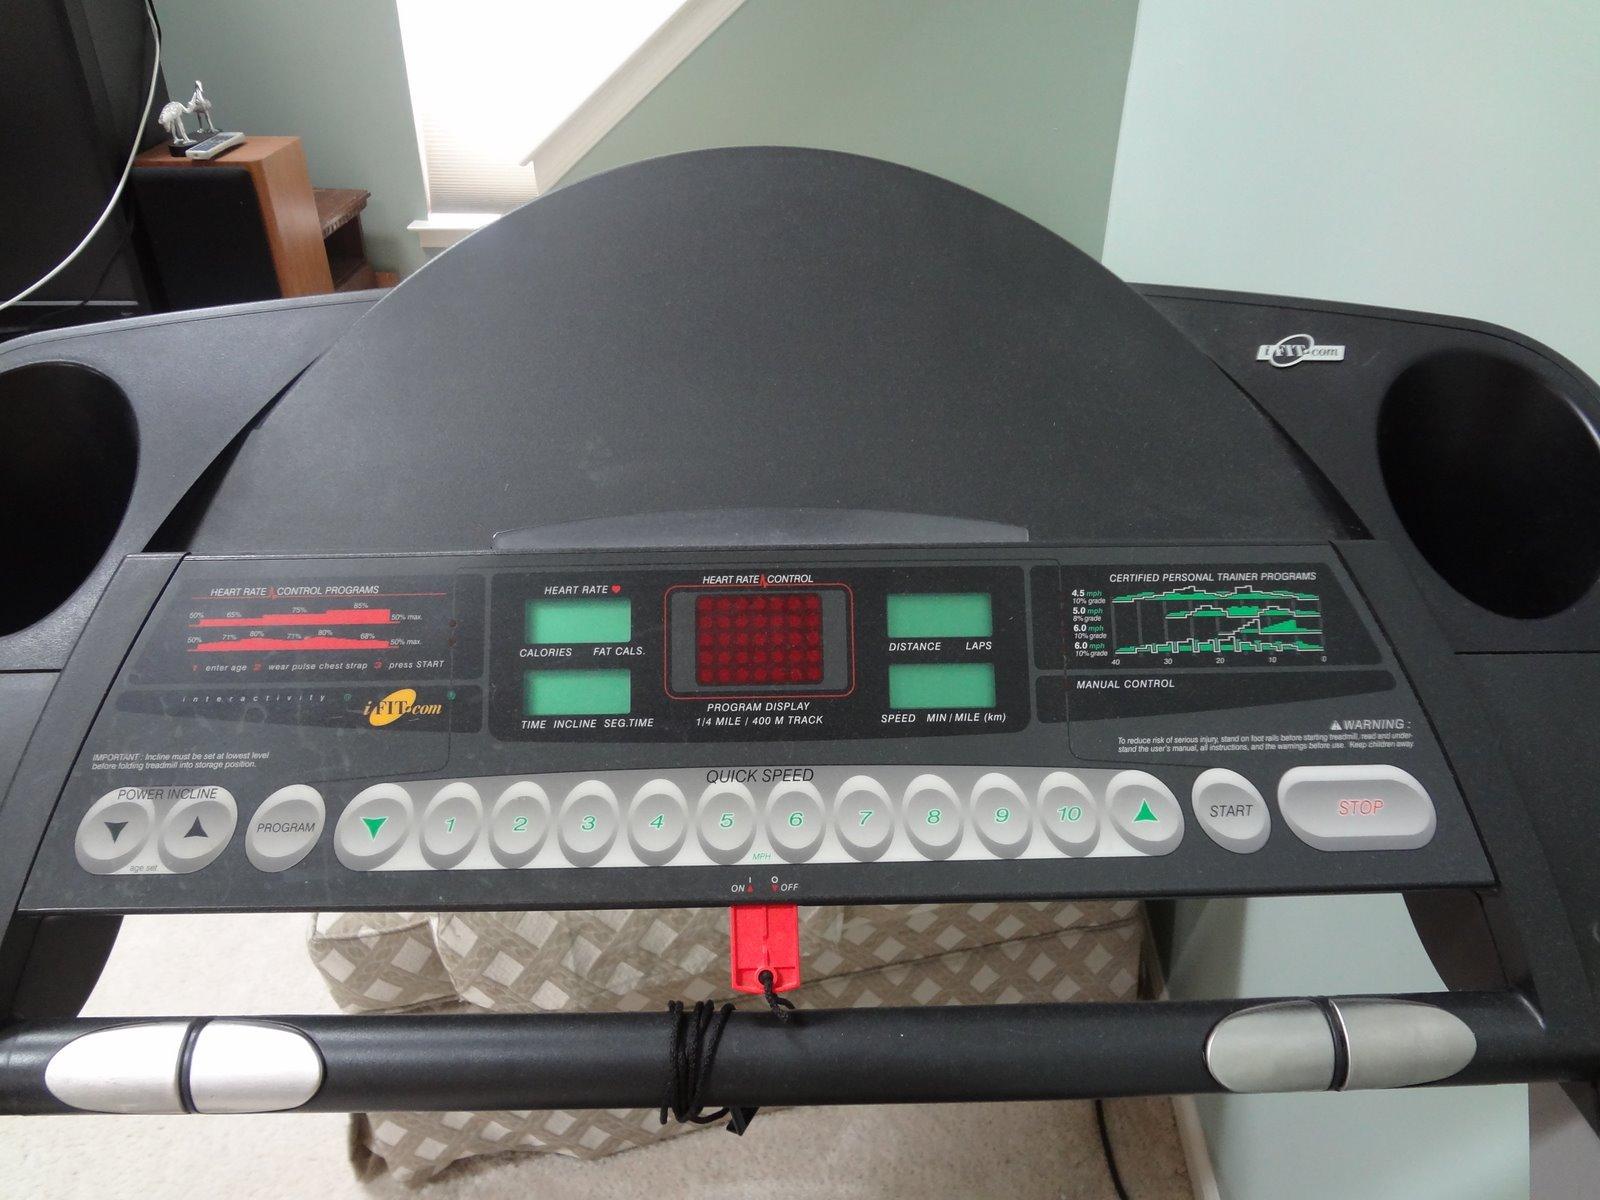 100+ Proform Treadmill Owner Manual – yasminroohi